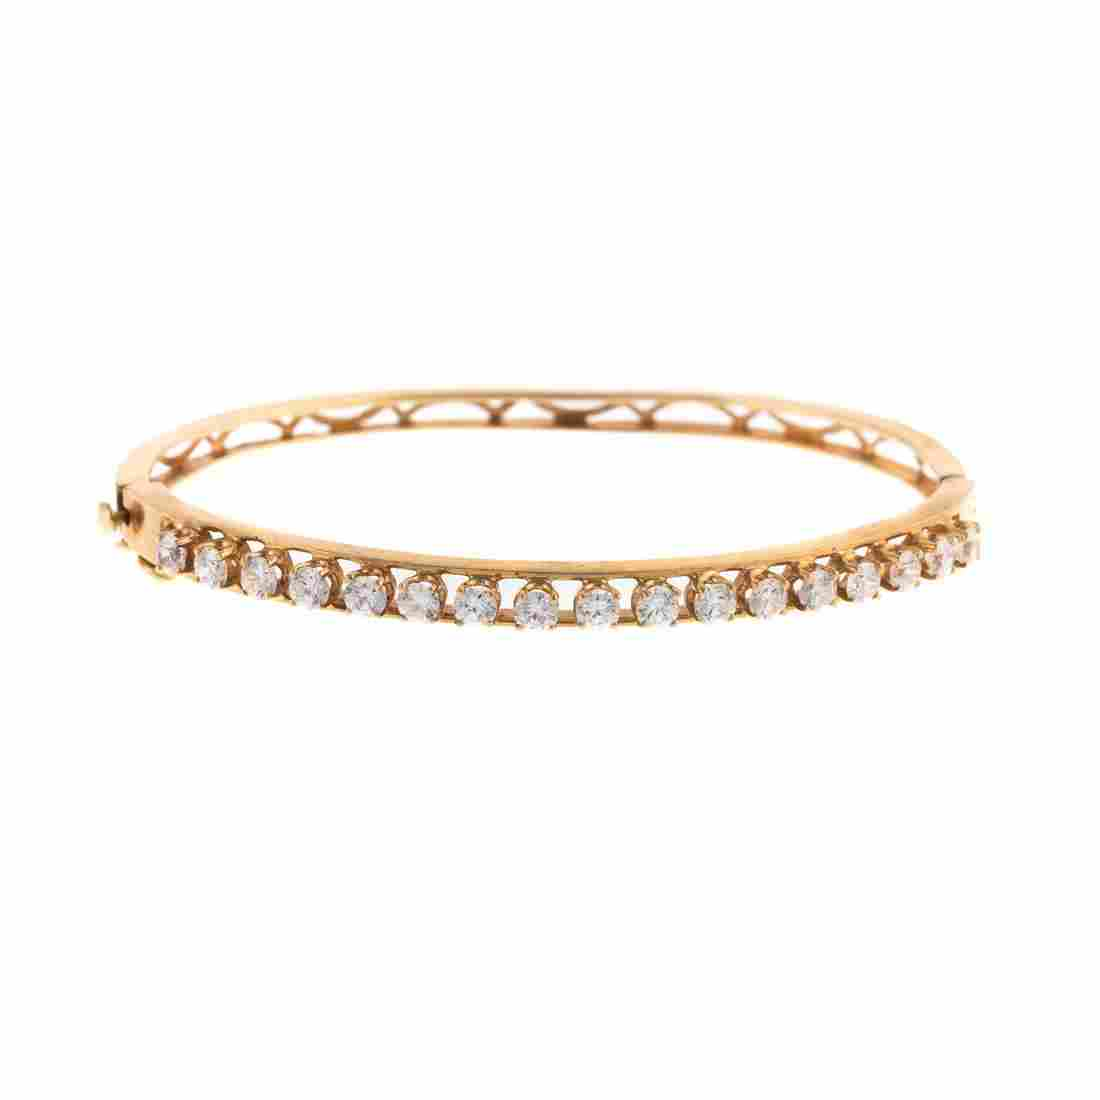 A Ladies Diamond Bangle Bracelet in 14K Gold